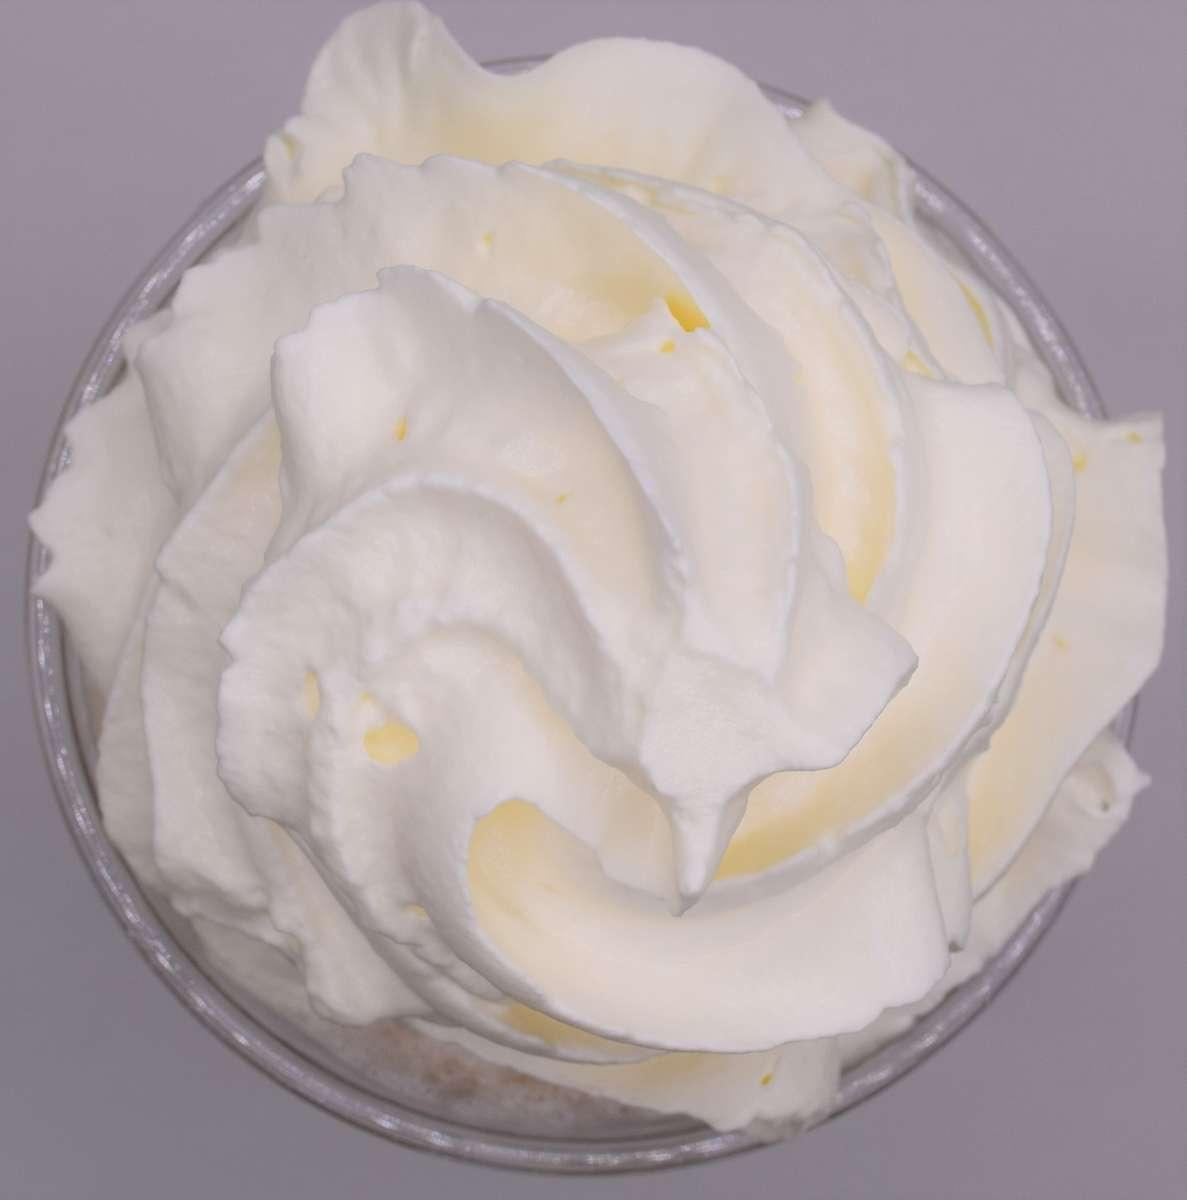 White Chocolate Blender